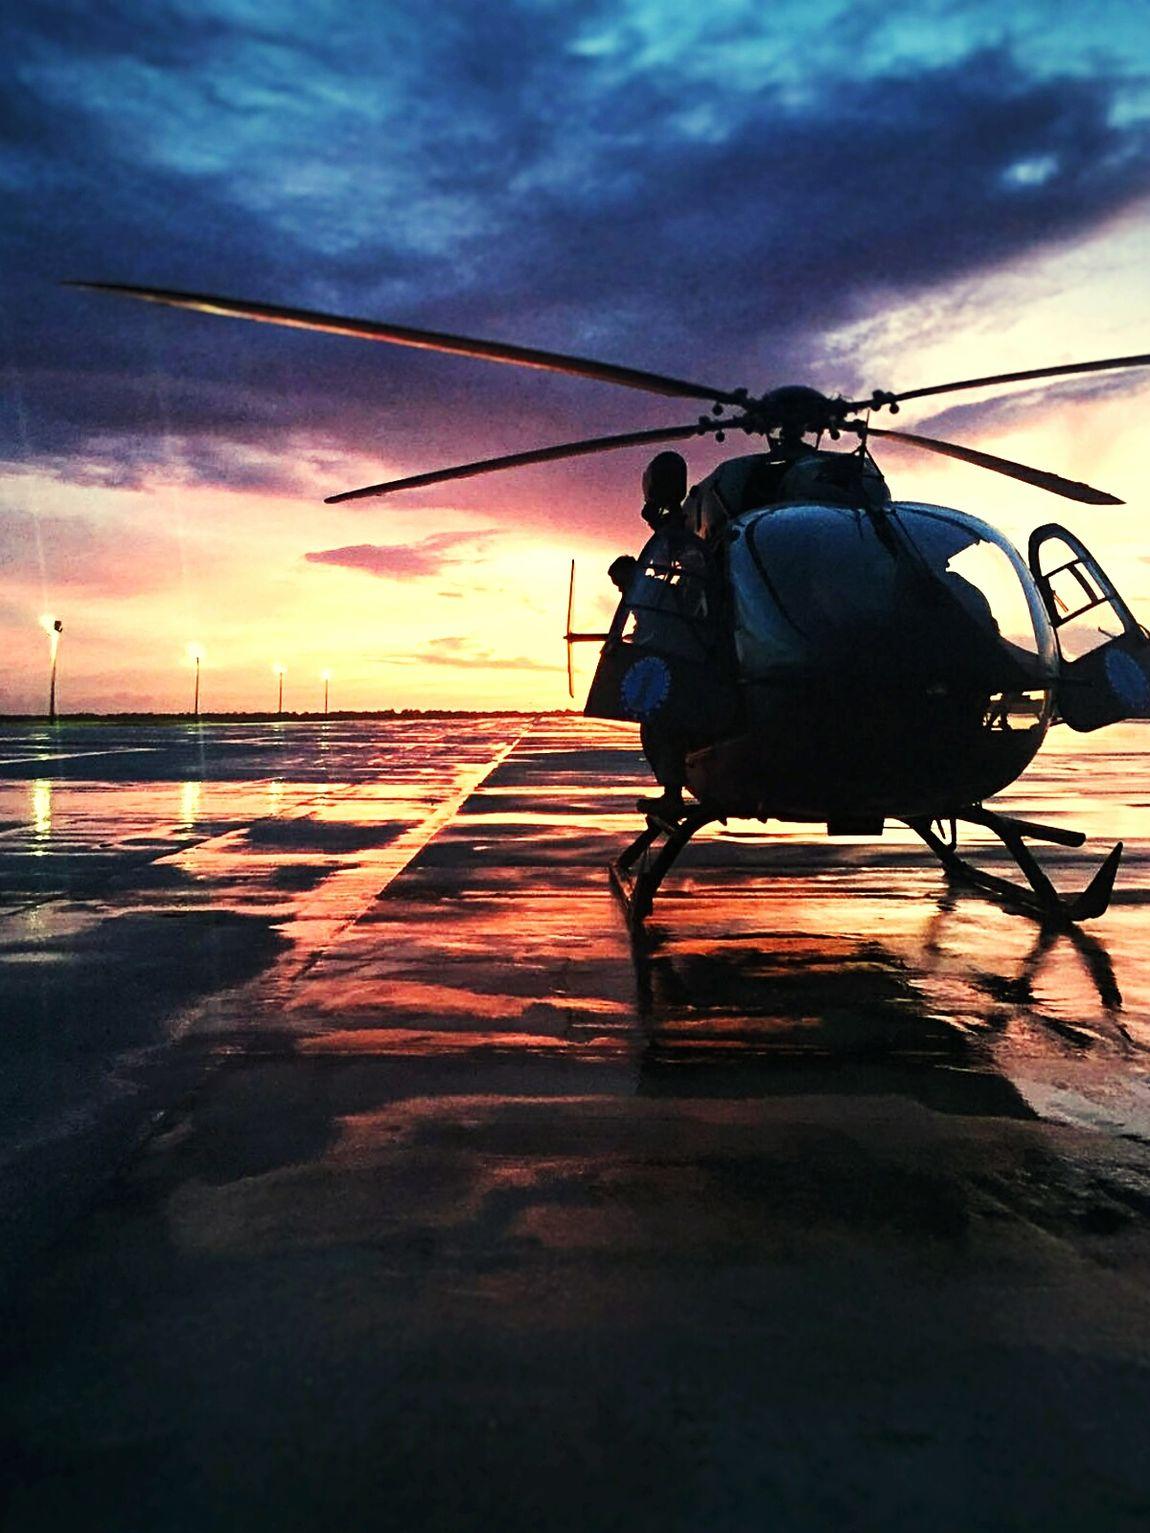 Lucky we live here. Guam Aviation Outdoors Sunset Night Flights Guam ANG Lucky We Live Guam GUdlife GUAM..a Place I Call Home Where America's Day Begins Lakota Aviation AFFB Army Aviation Army National Guard